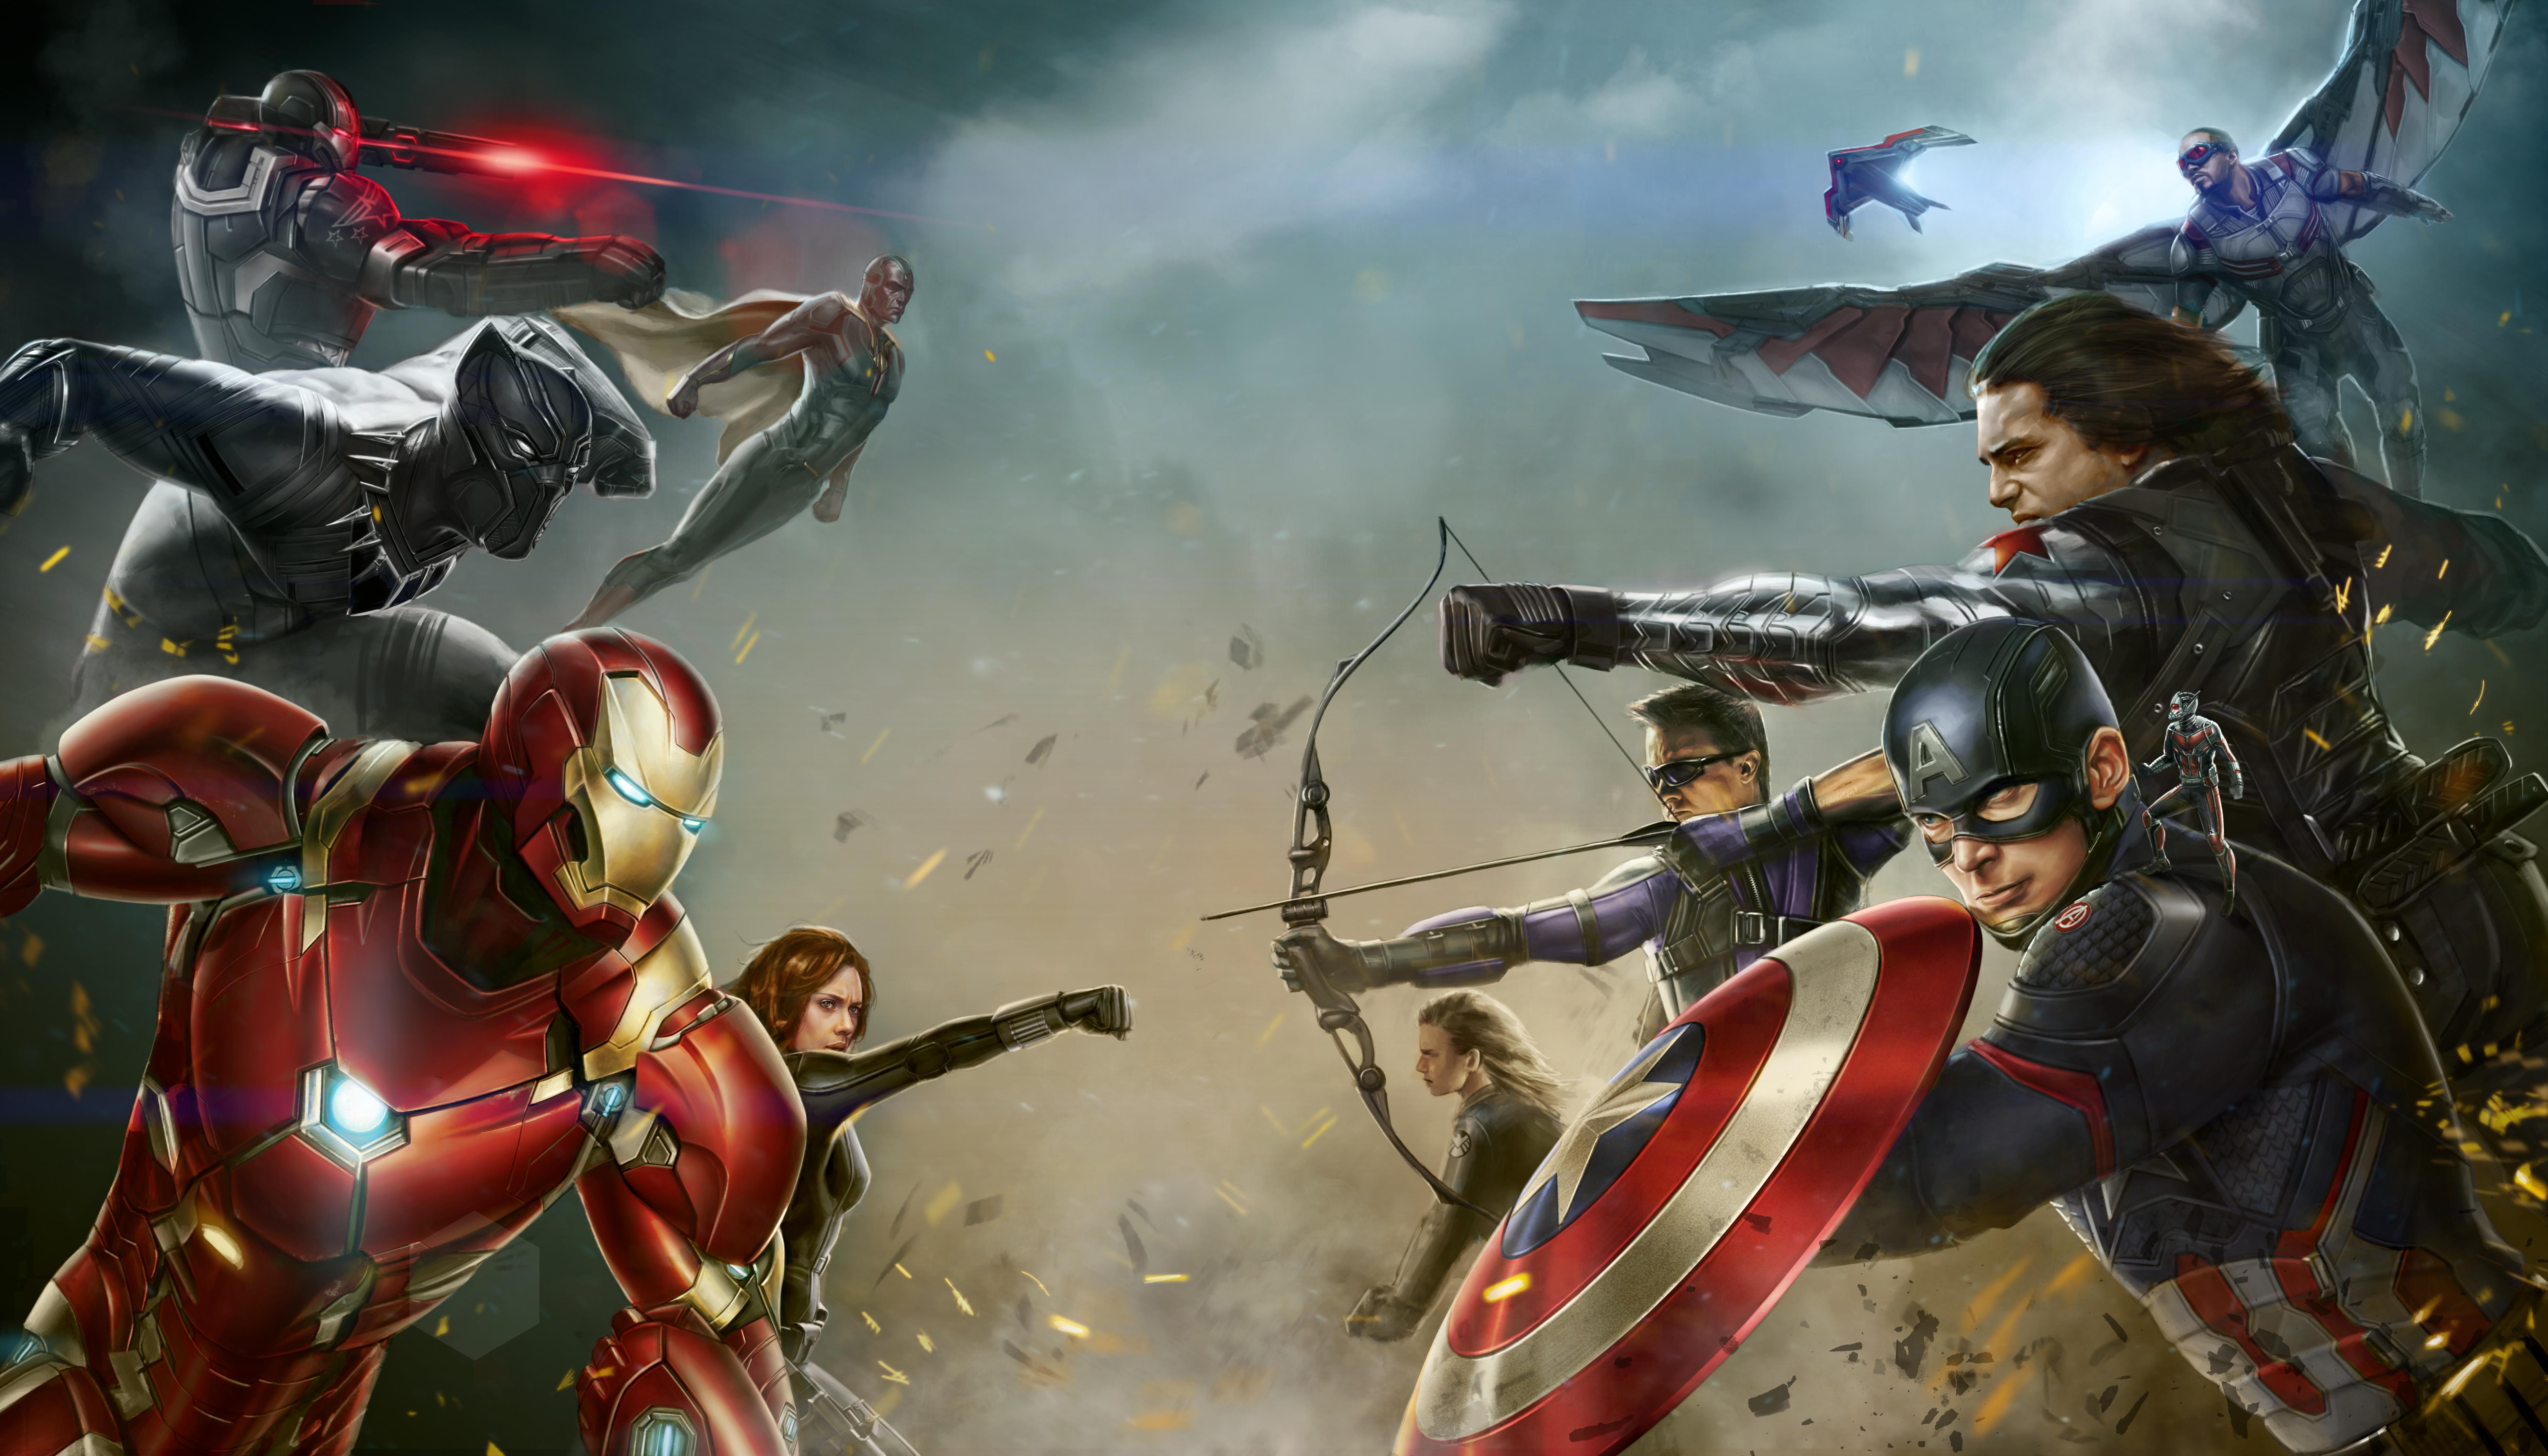 7680x4320 Marvel Superhero 8k Digital Art 8k Hd 4k Wallpapers